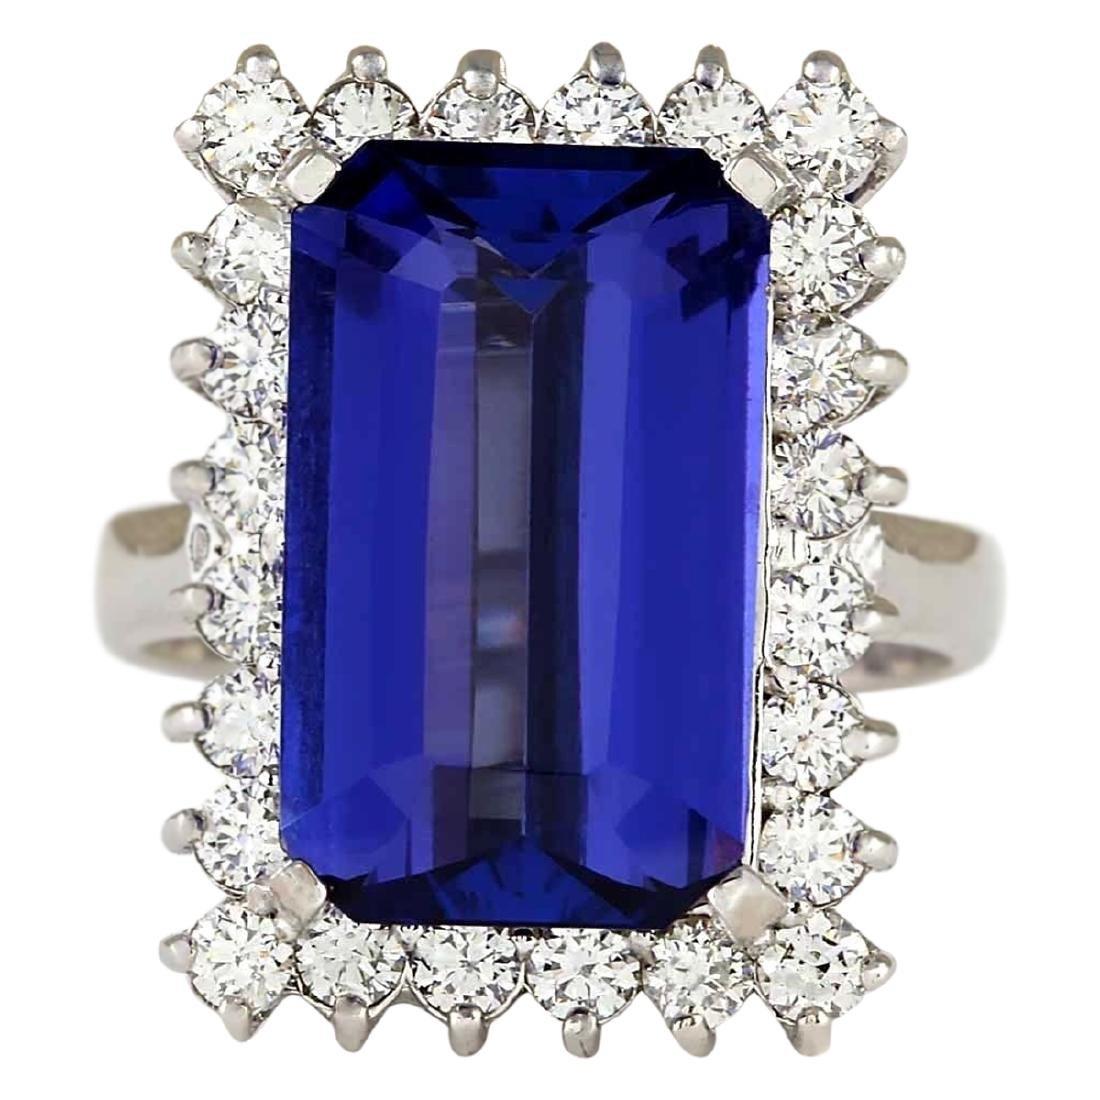 9.05 CTW Natural Blue Tanzanite And Diamond Ring 18K